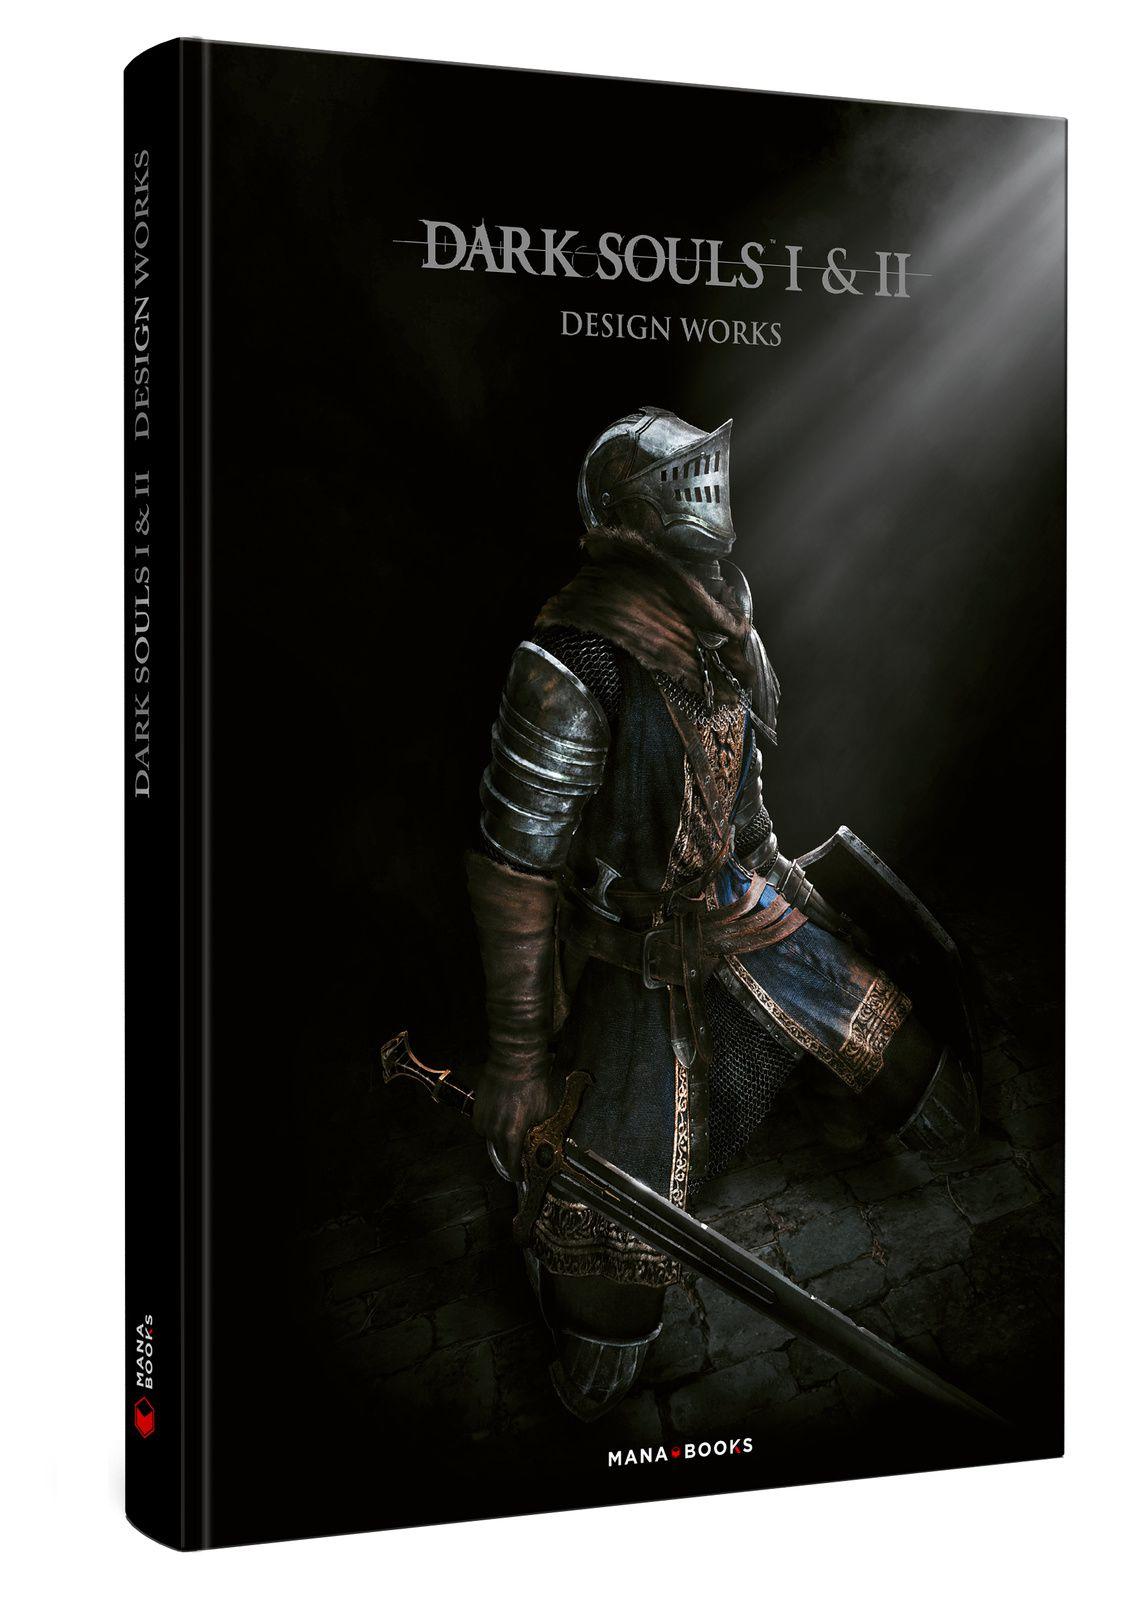 [REVUE LIVRE GAMING] ARTBOOK DARK SOULS I & II  DESIGN WORKS aux éditions MANA BOOKS